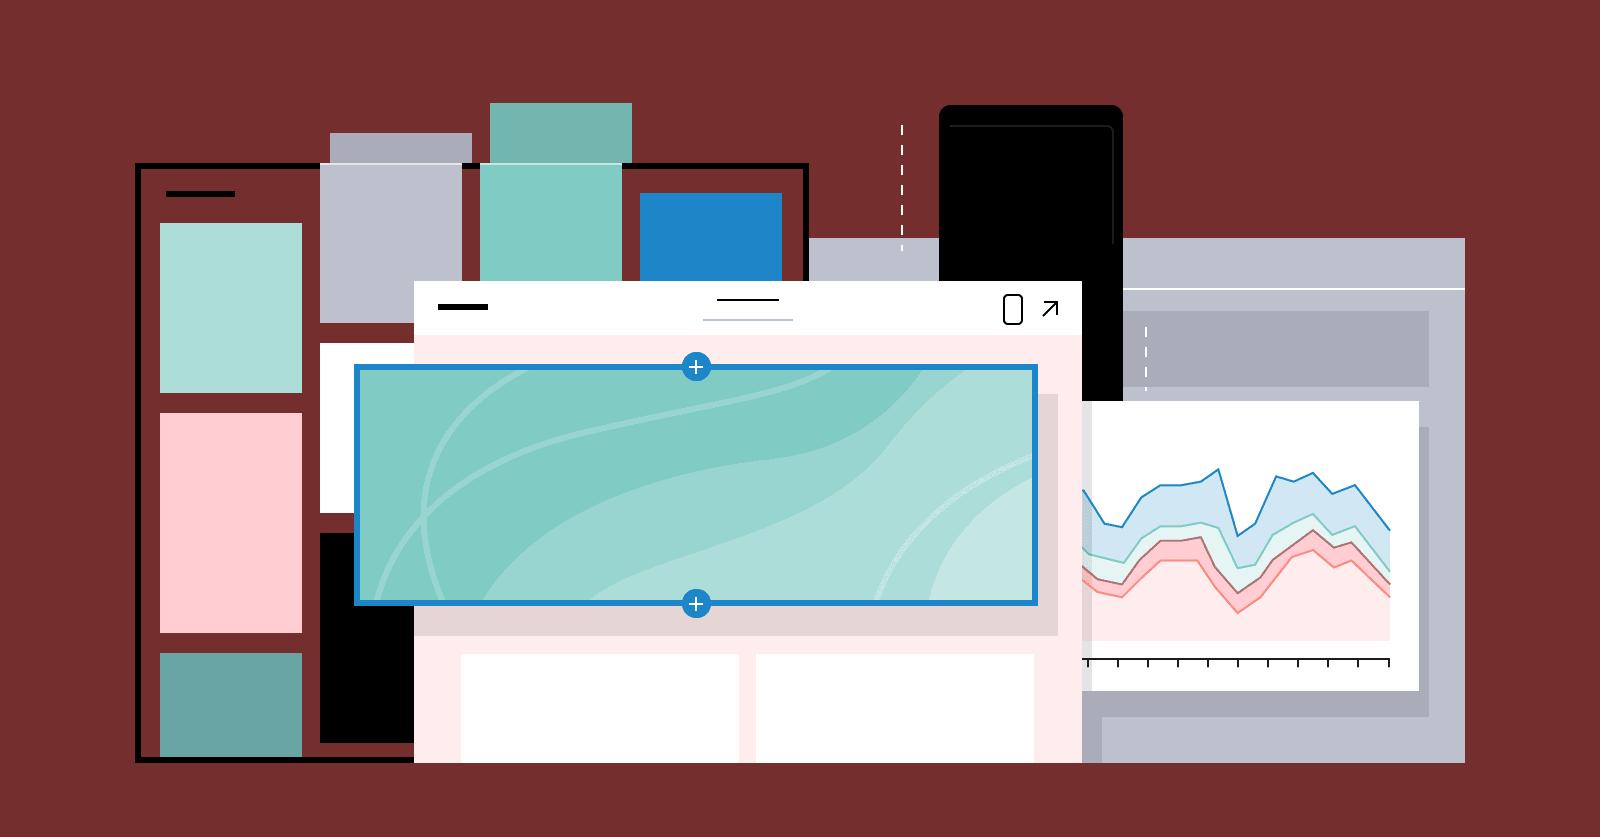 Squarespace Subscriber and Revenue Statistics